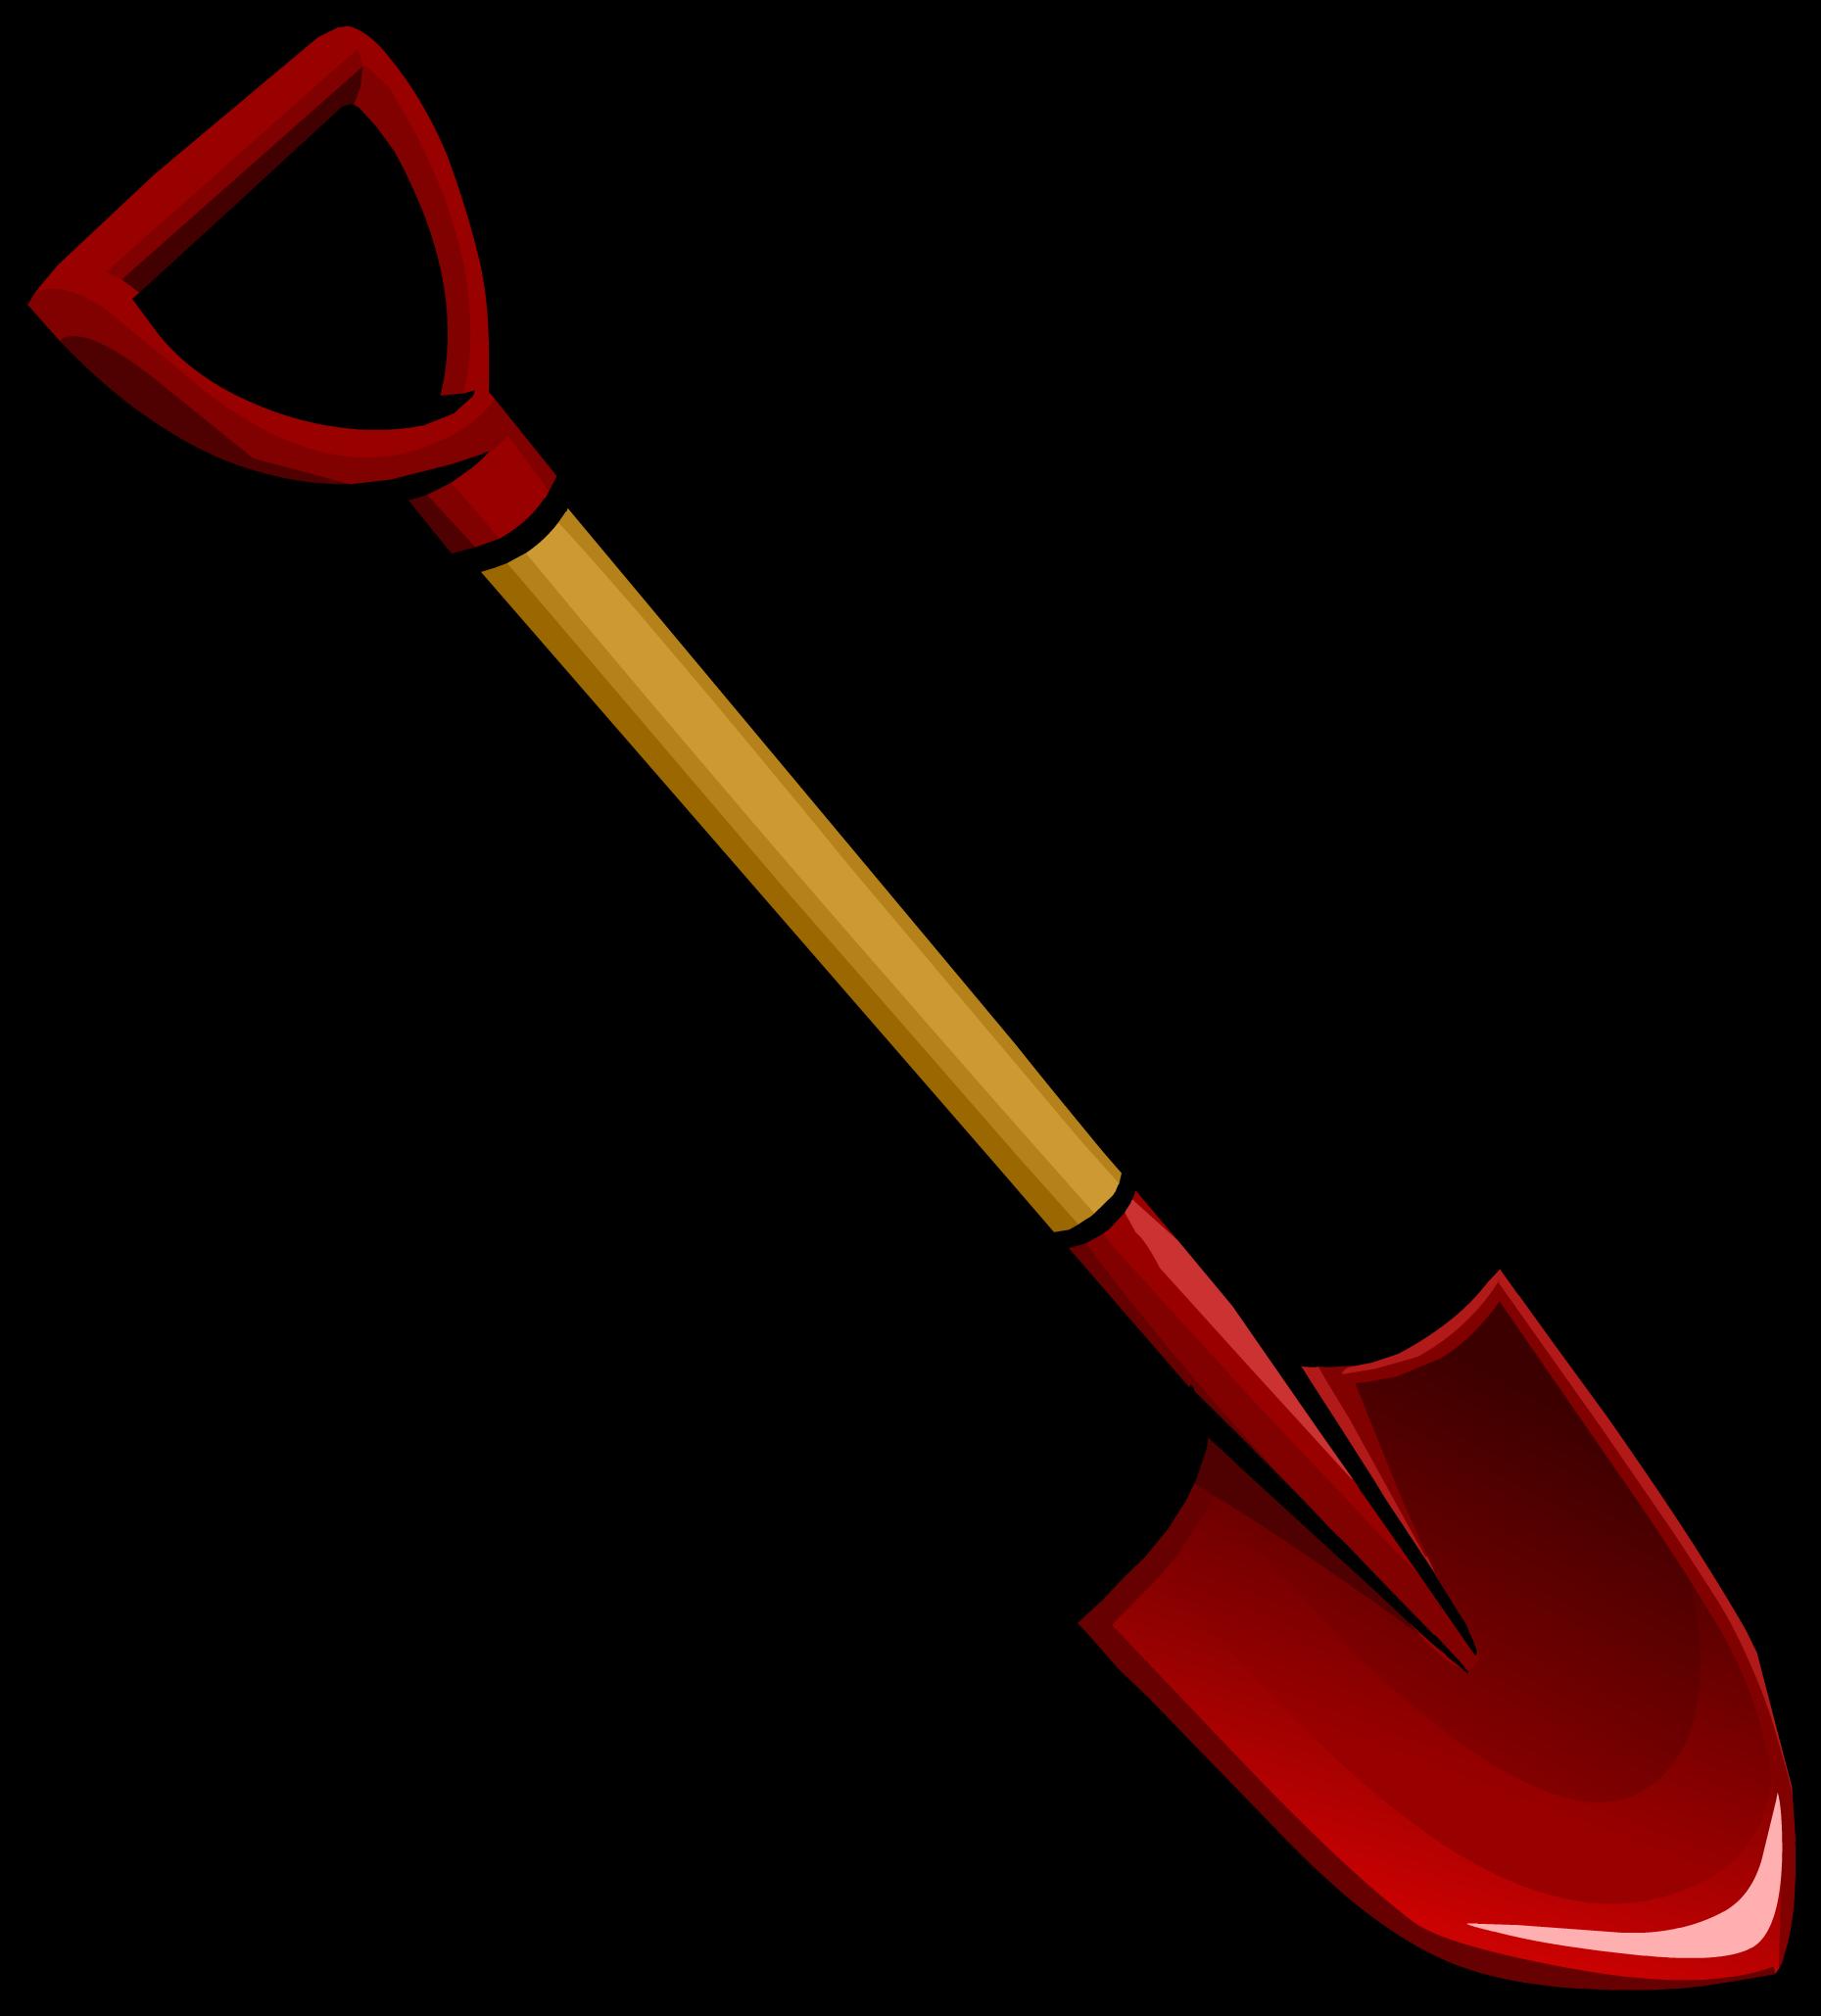 Image gardenshovel png club. Pirates clipart tool